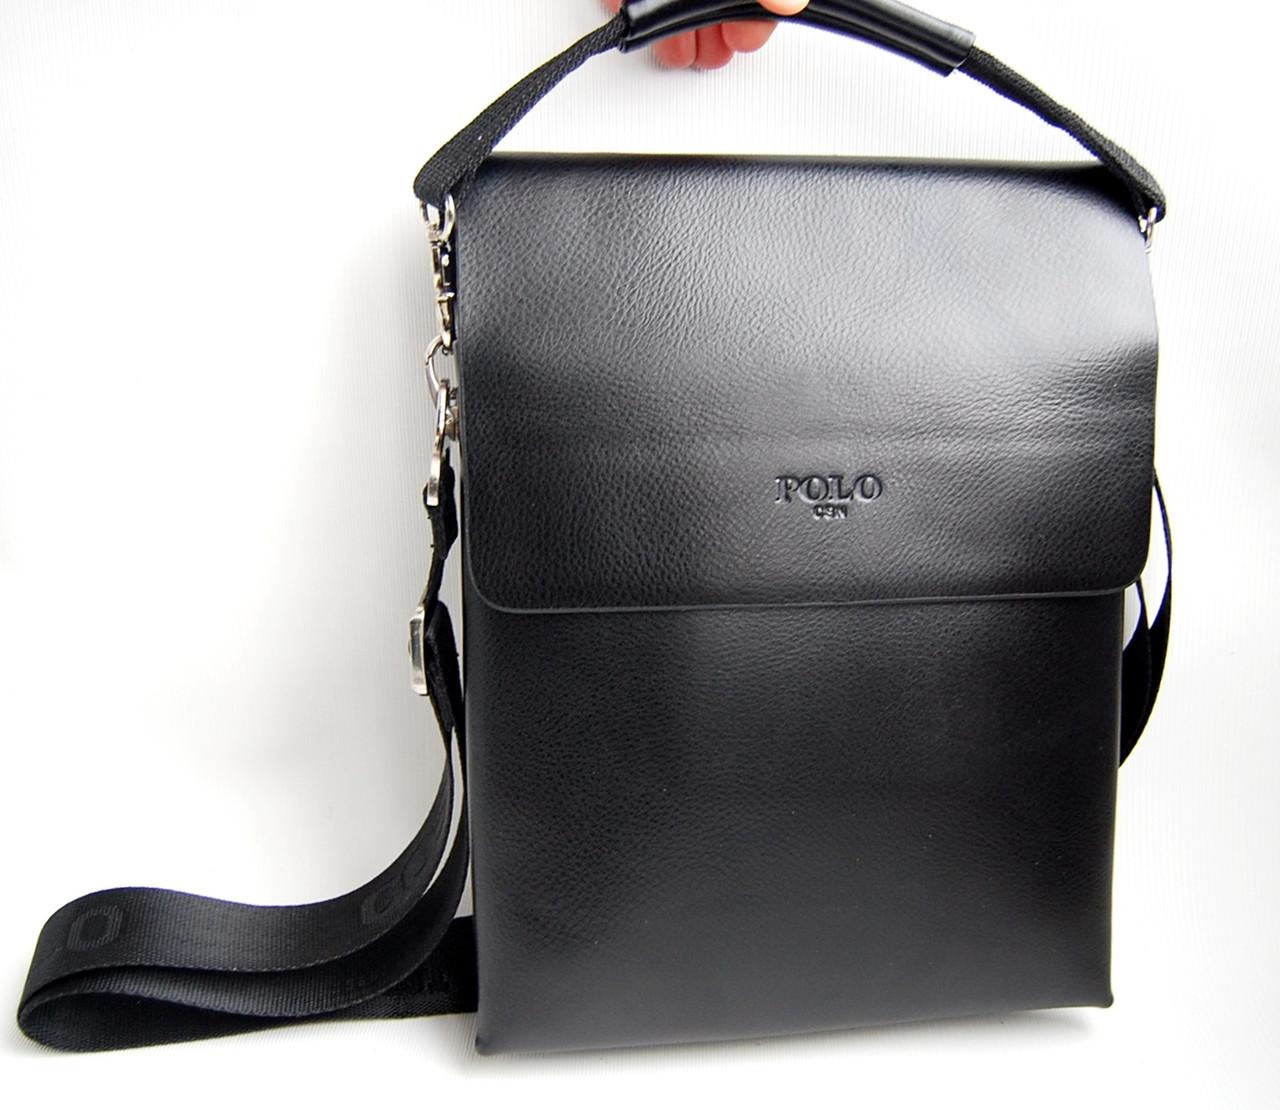 fd261c7b6ddd Мужская сумка-планшет Polo 9880-3 с ручкой КС31 - интернет-магазин